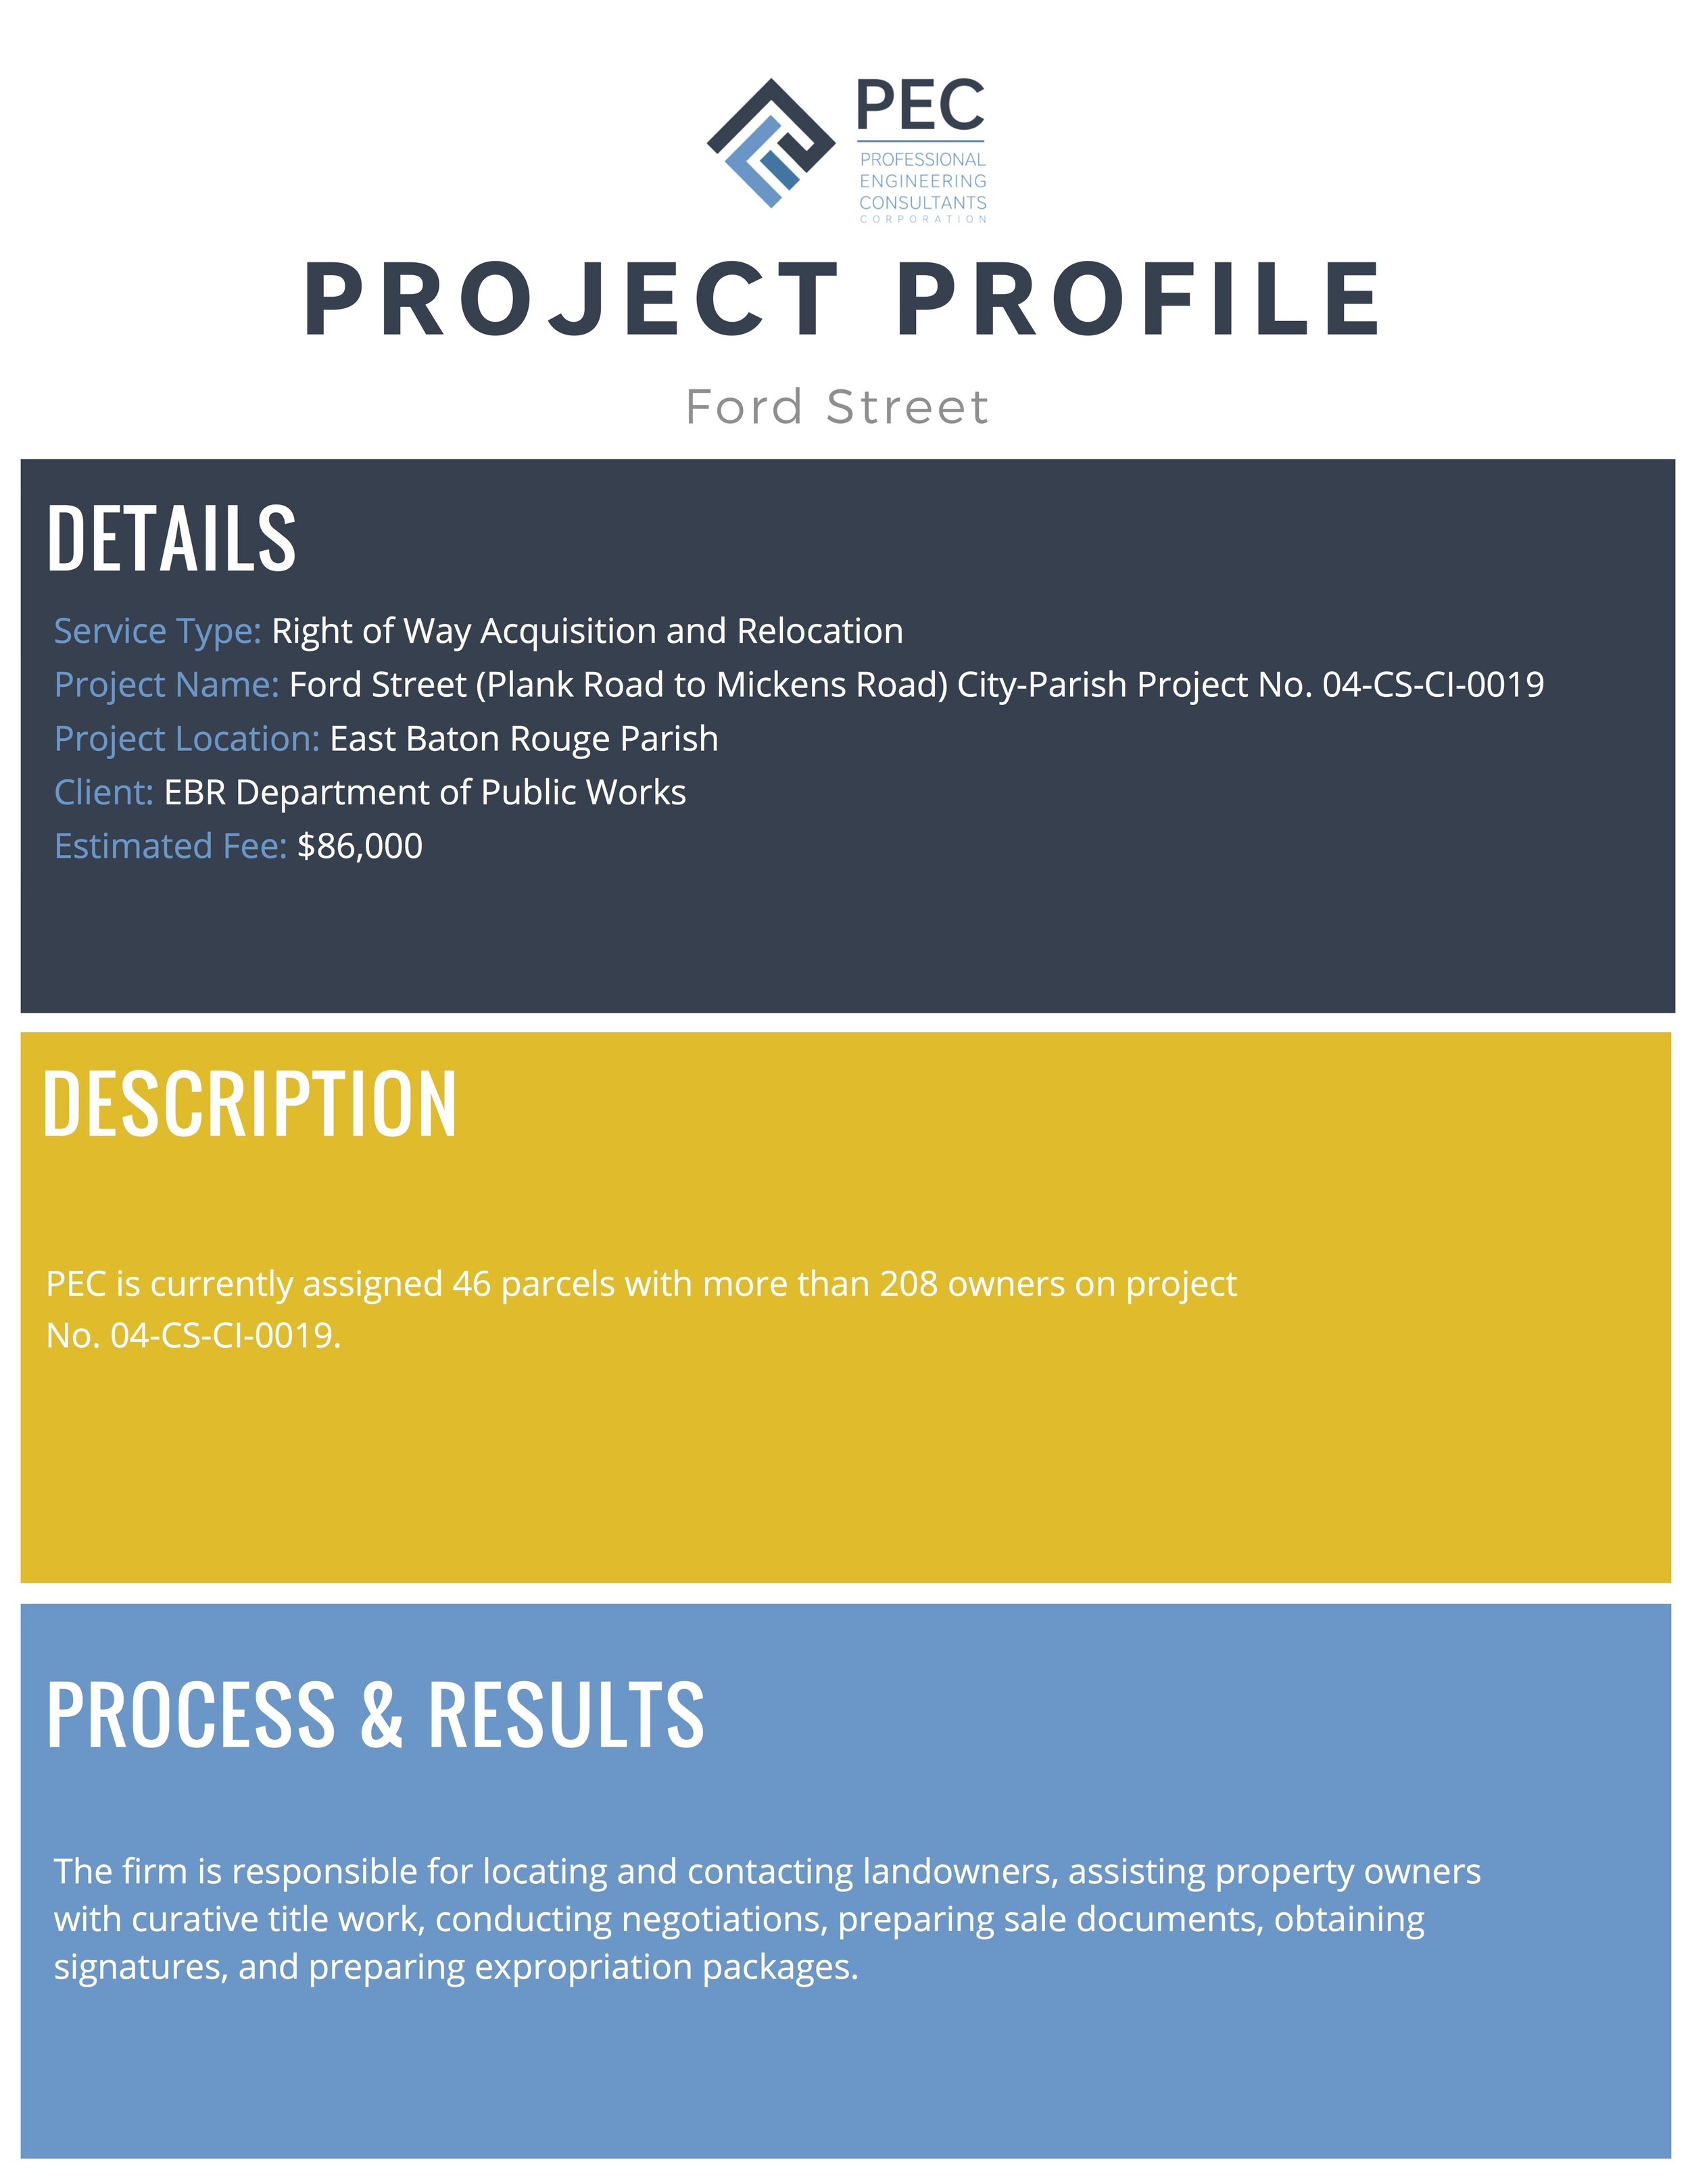 Project Profile_FordStreet.jpg